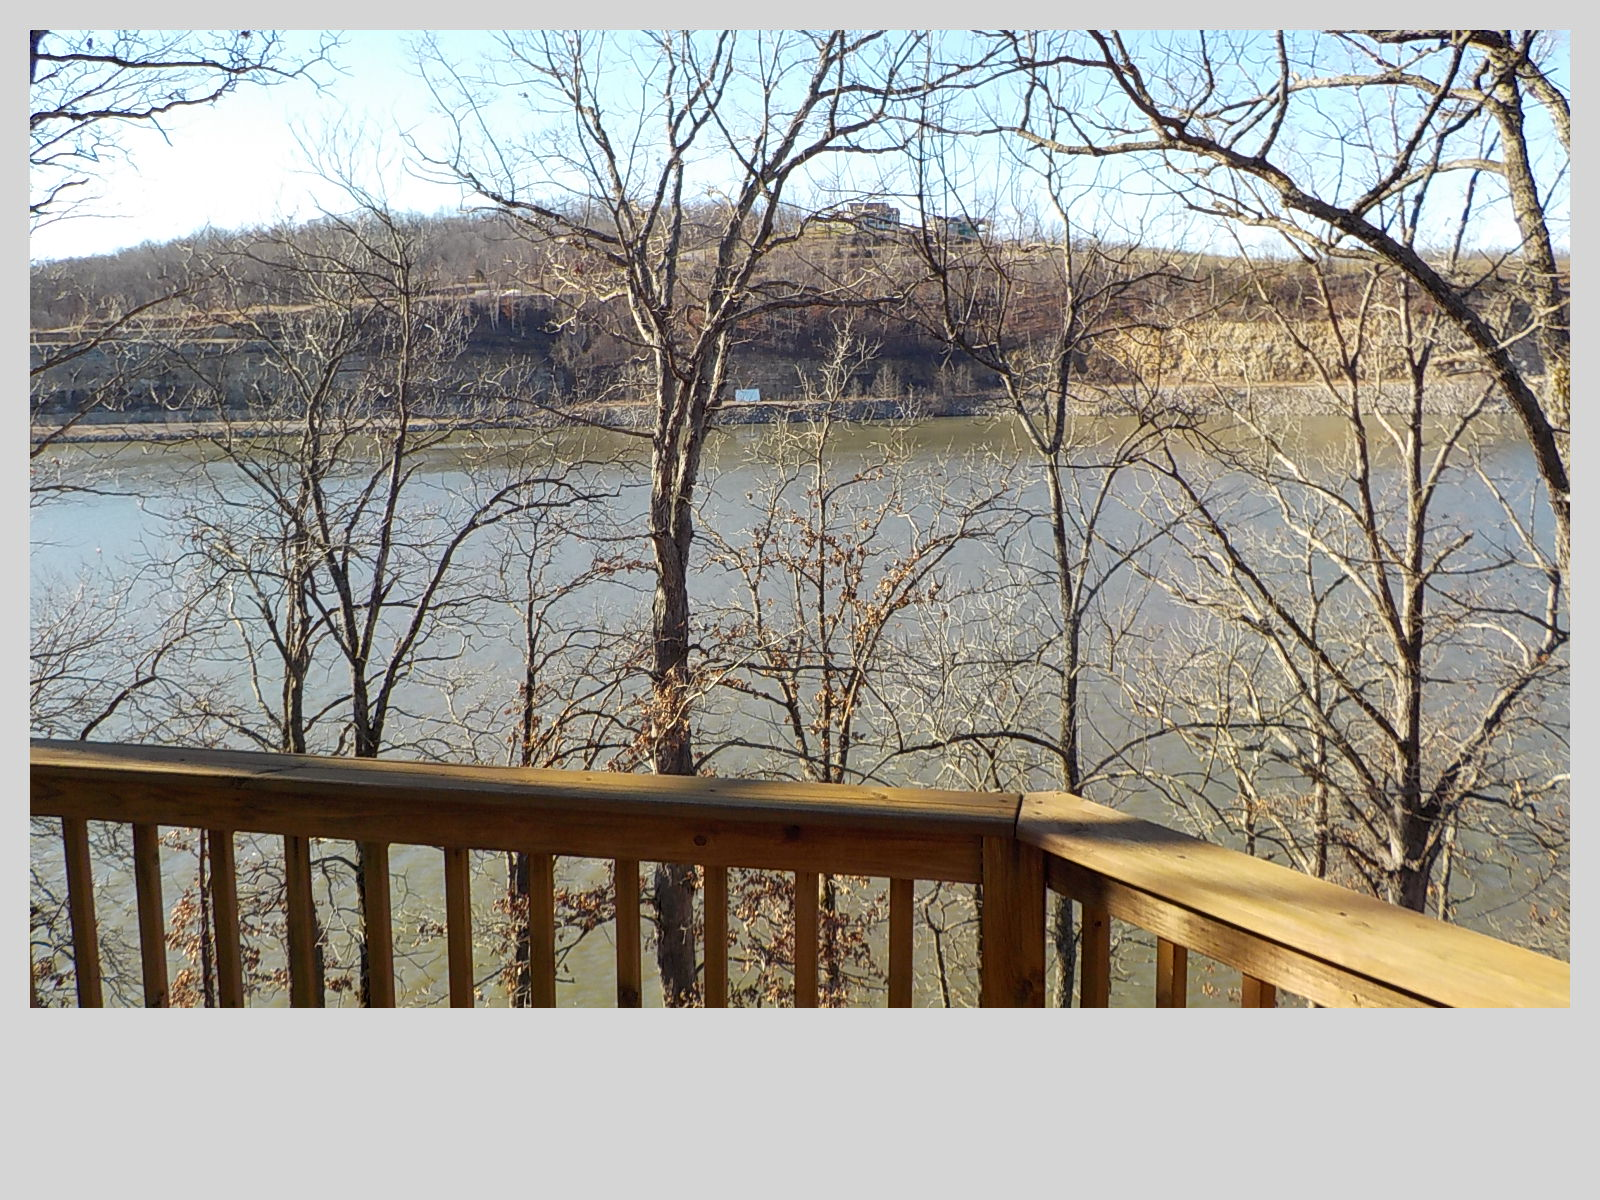 398 Myers Rd, Linn Creek, Missouri 65052